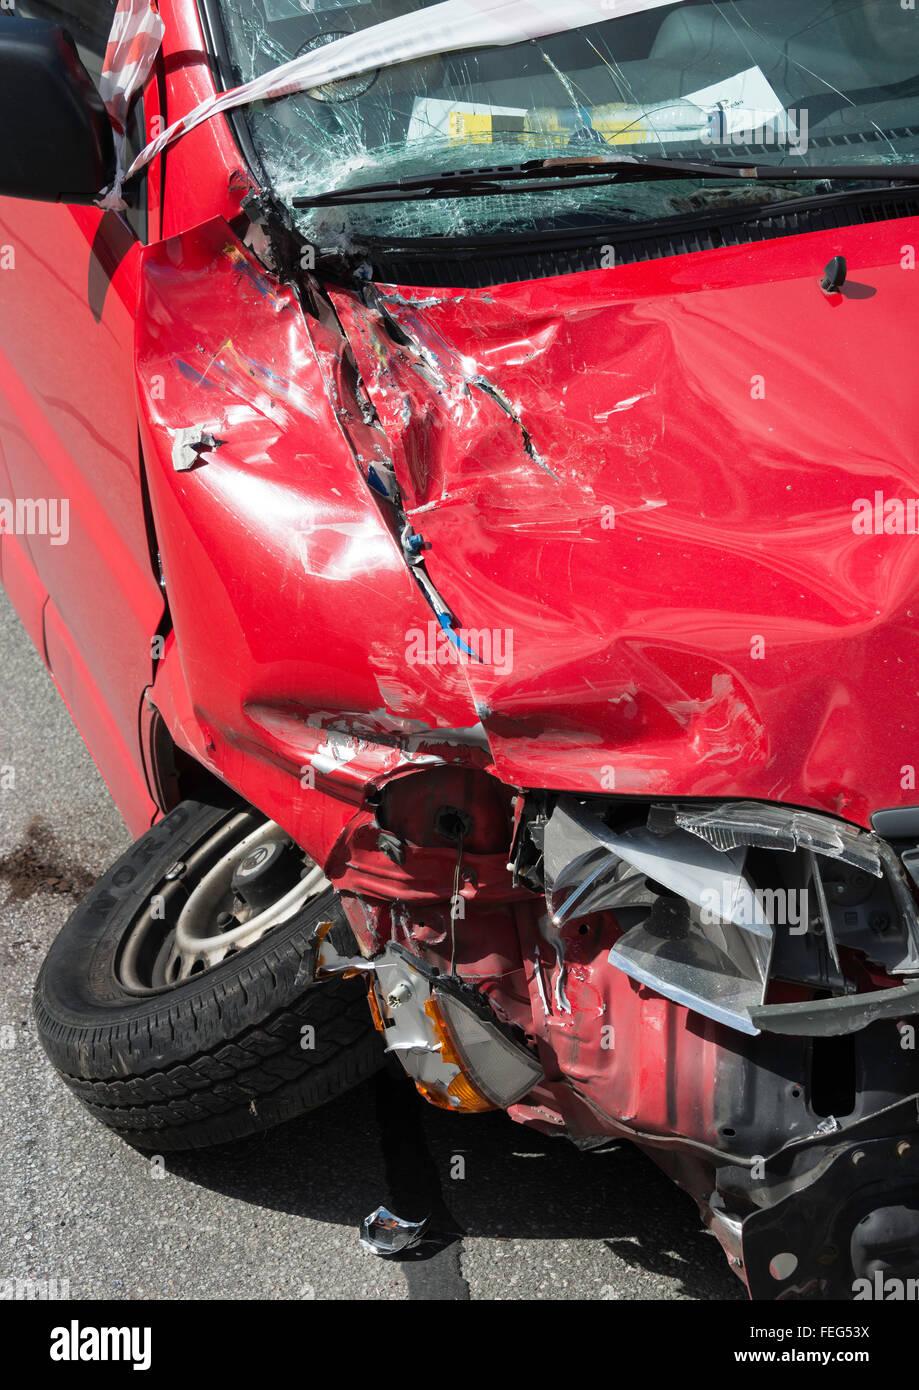 Car frontage damaged in road accident, Copenhagen, Hovedstaden Region, Kingdom of Denmark - Stock Image